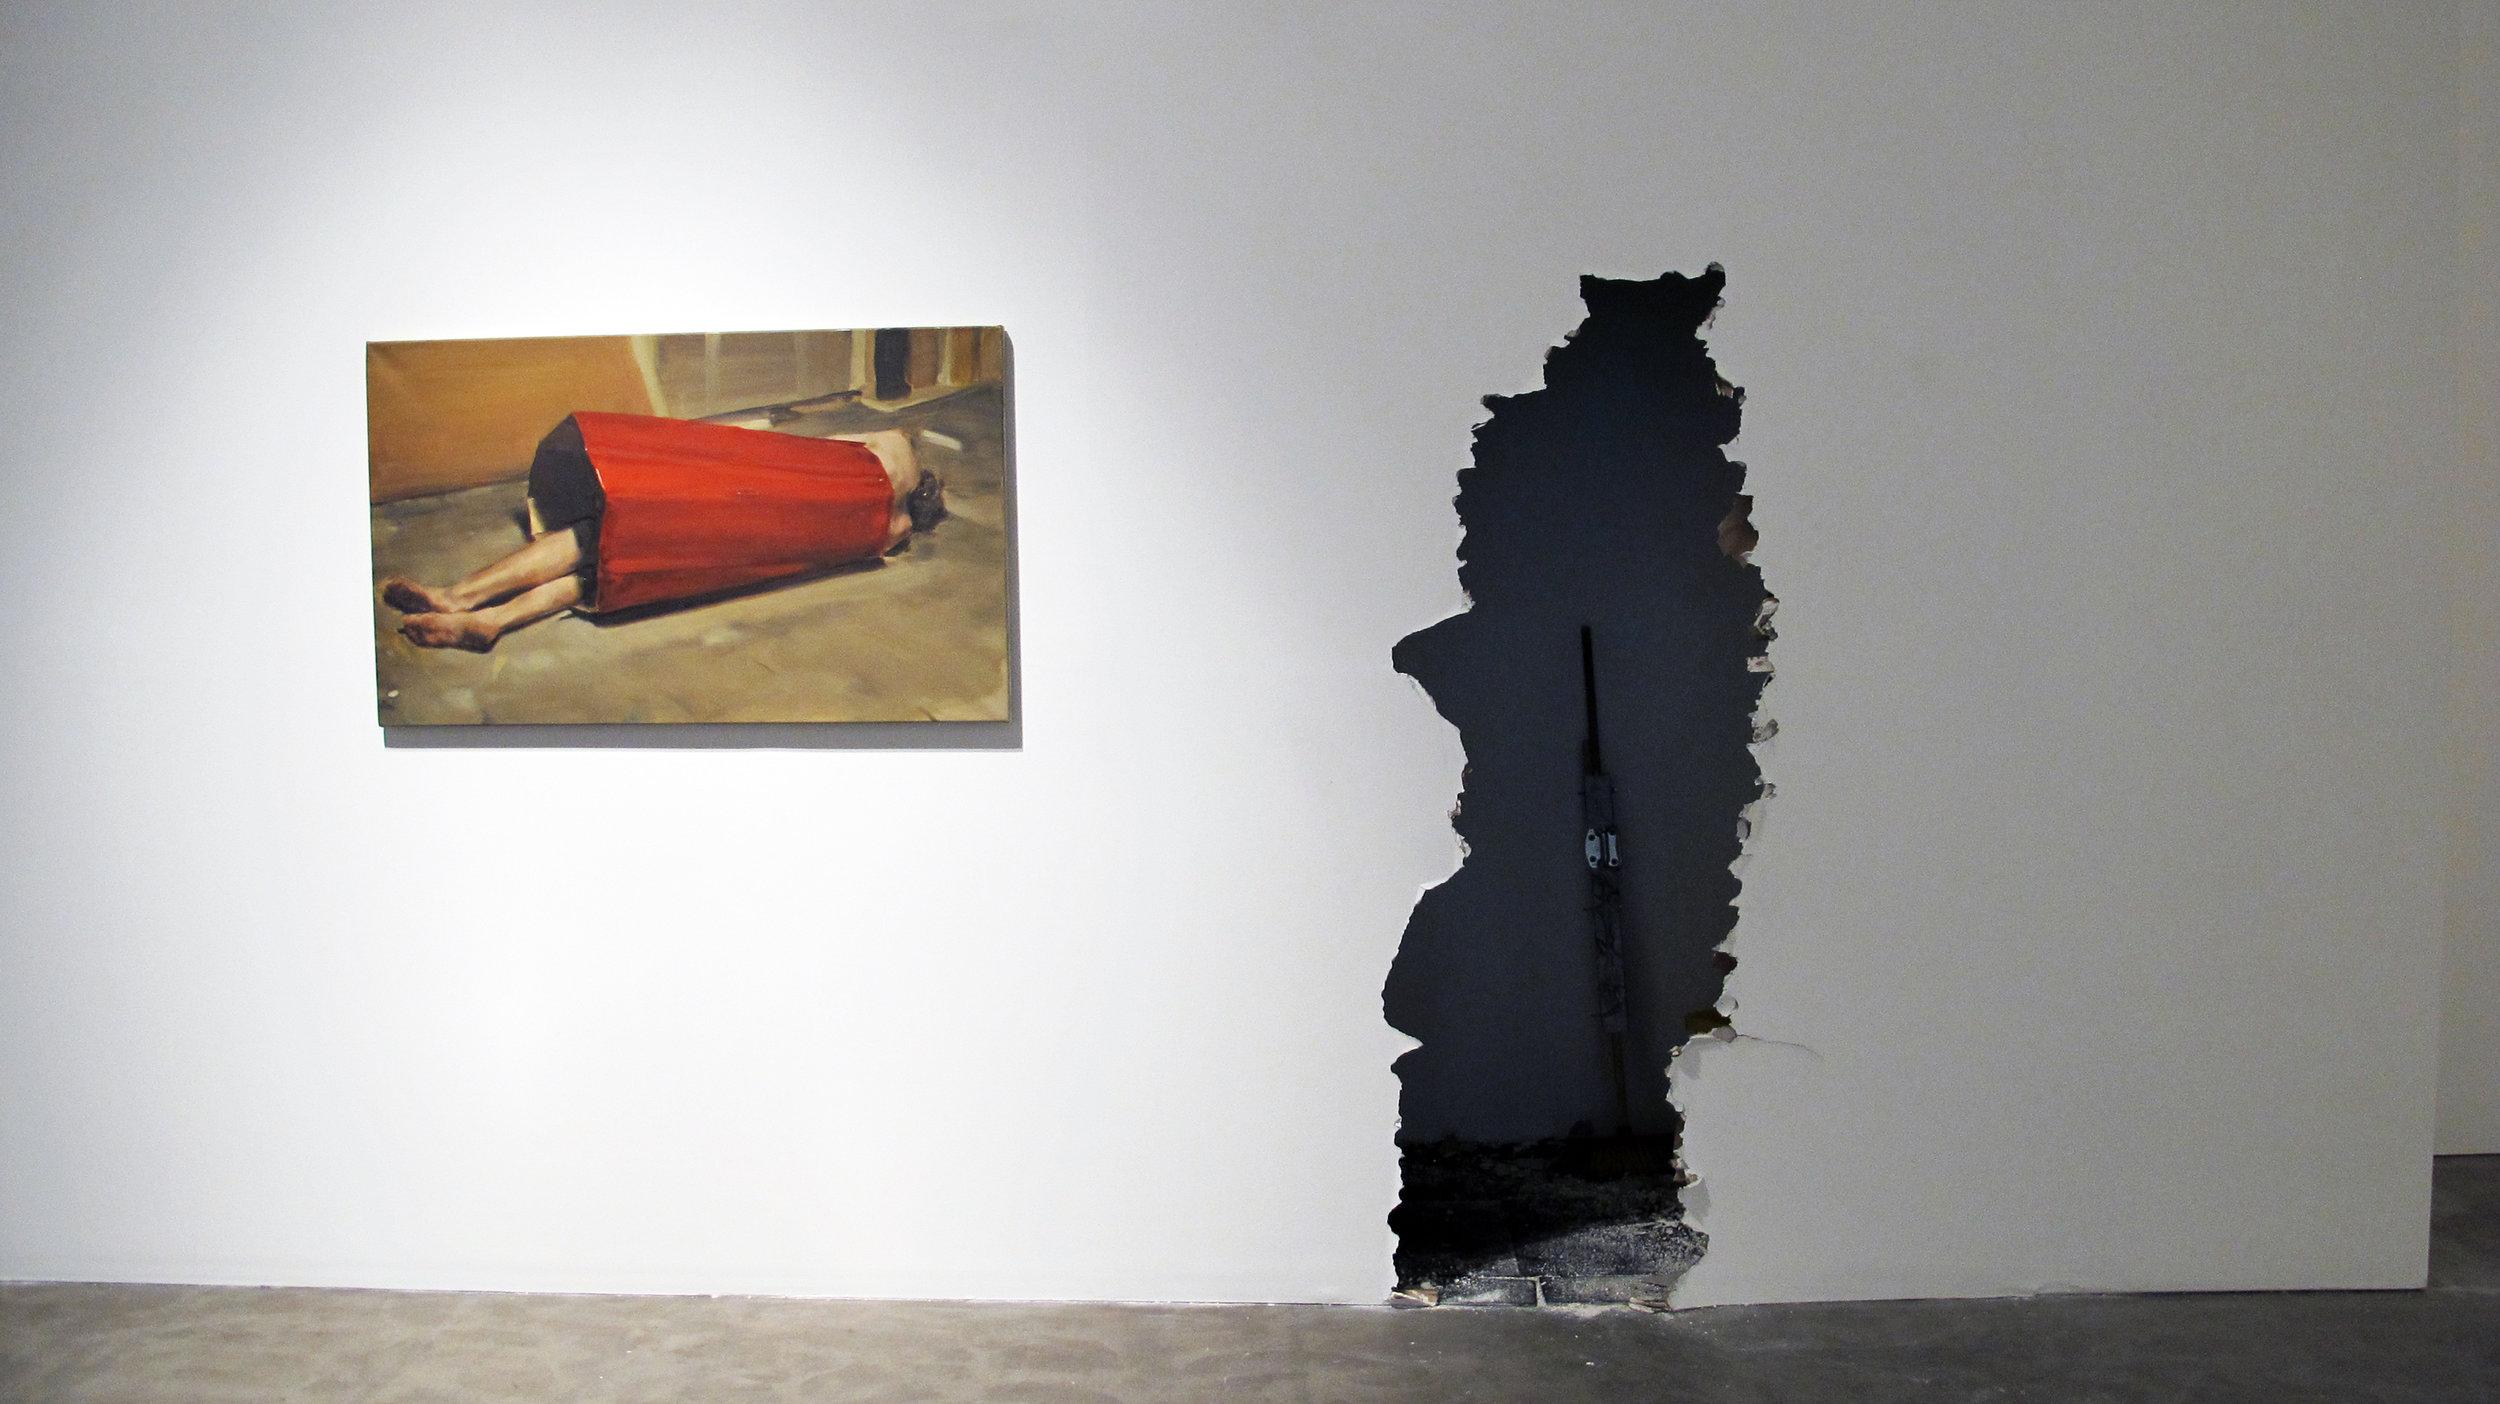 Freeman-Lowe, PANOPTICUM, Robert Miller Gallery, Installation View 1.JPG